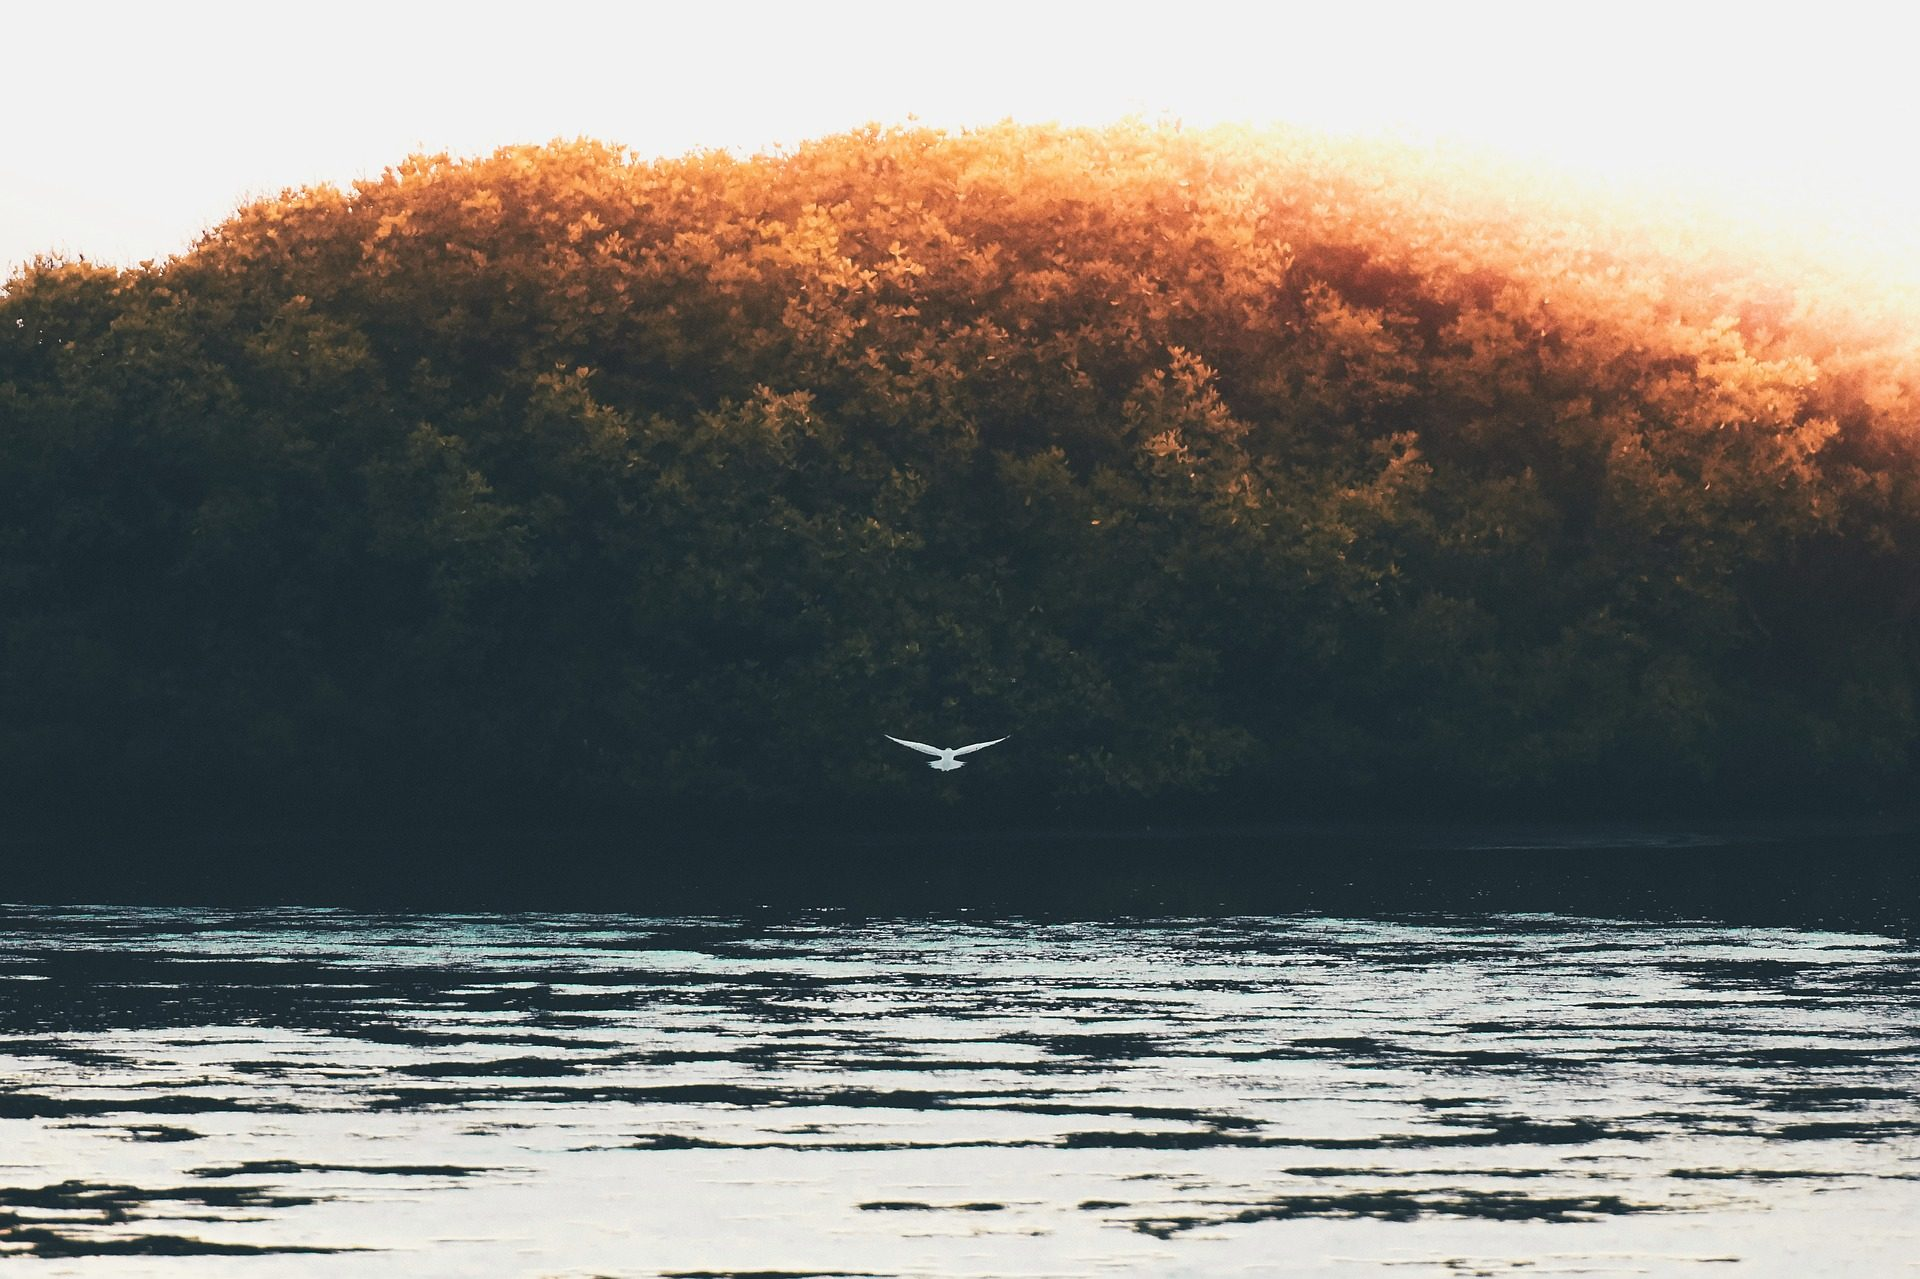 lago, río, árboles, pájaro, ave, vuelo - Fondos de Pantalla HD - professor-falken.com